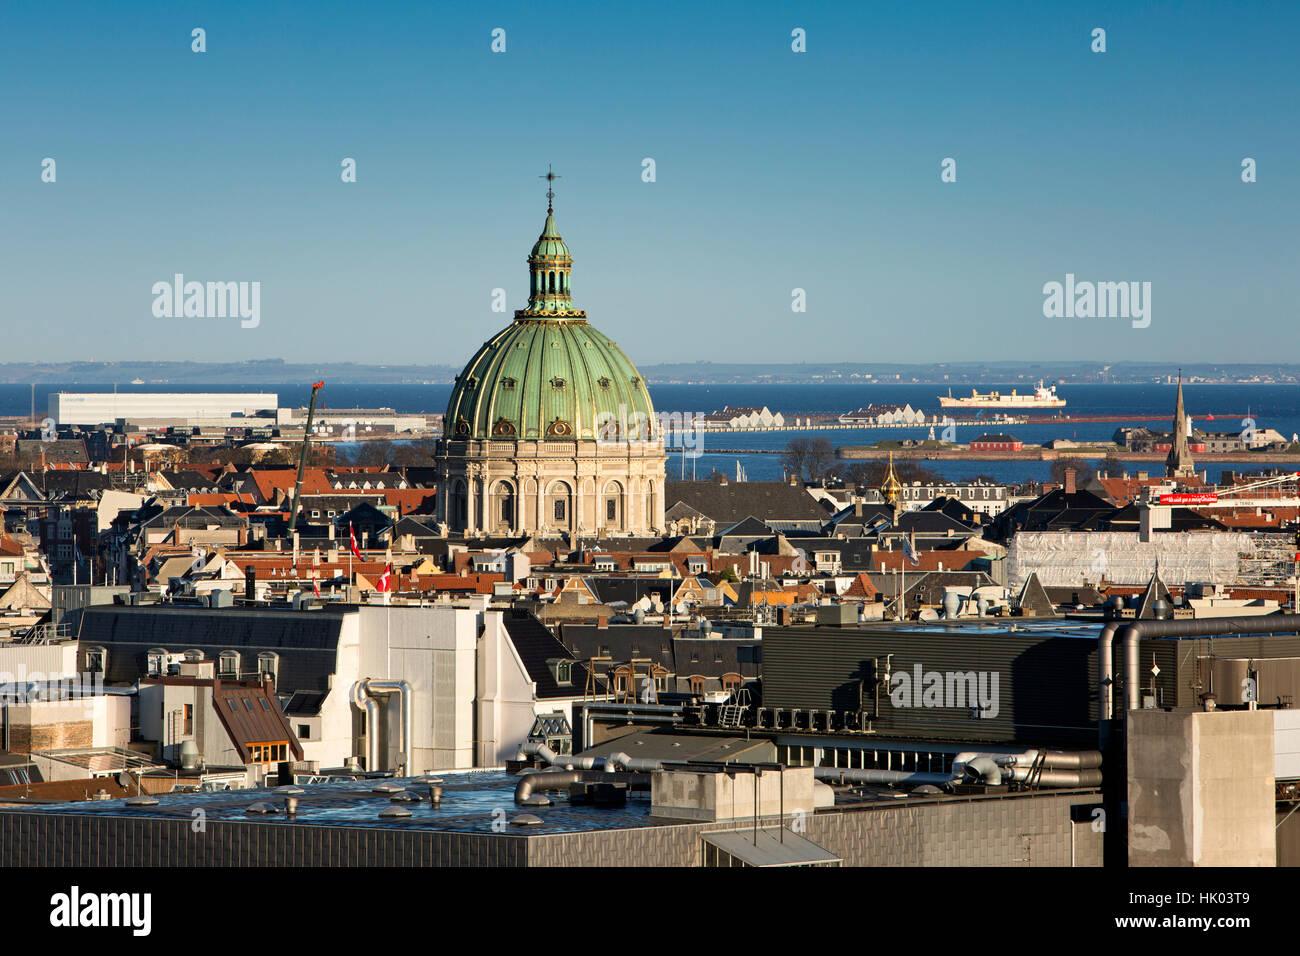 Dinamarca, Copenhague, cúpula verde de Frederiks Kirke, la iglesia de mármol, niveles elevados de vista Imagen De Stock